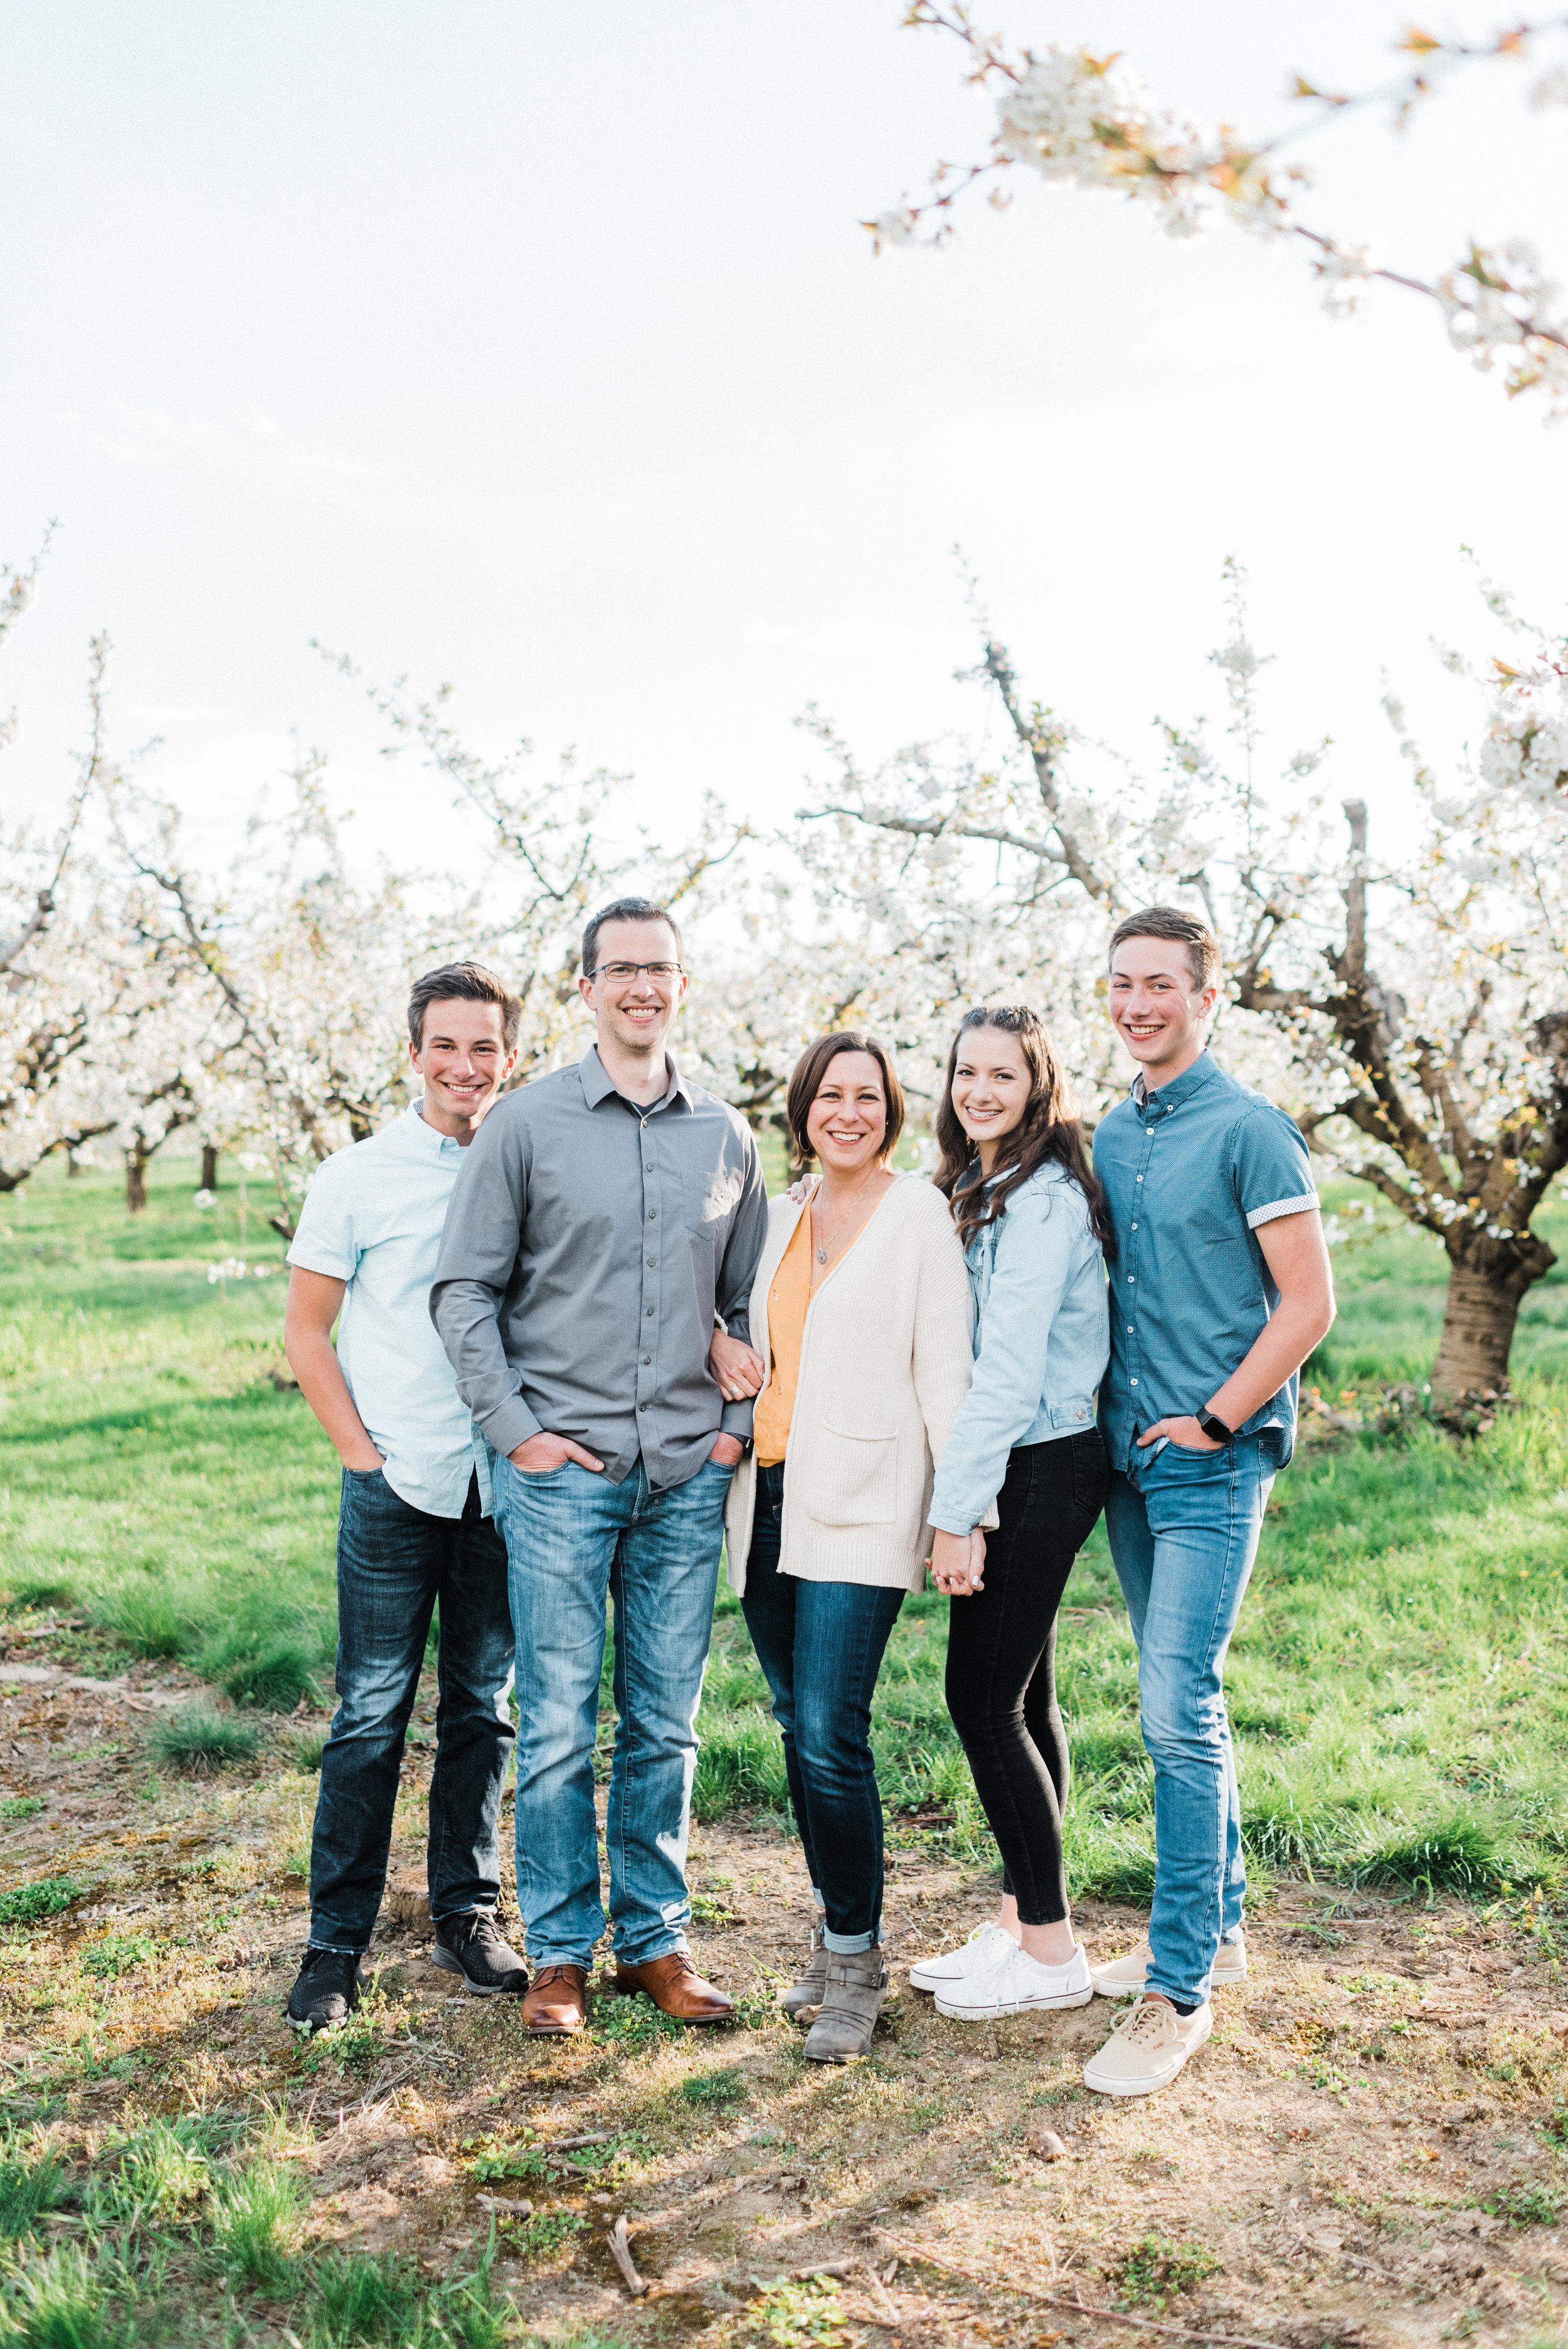 orchard_family_session_spokane_wa-2.jpg